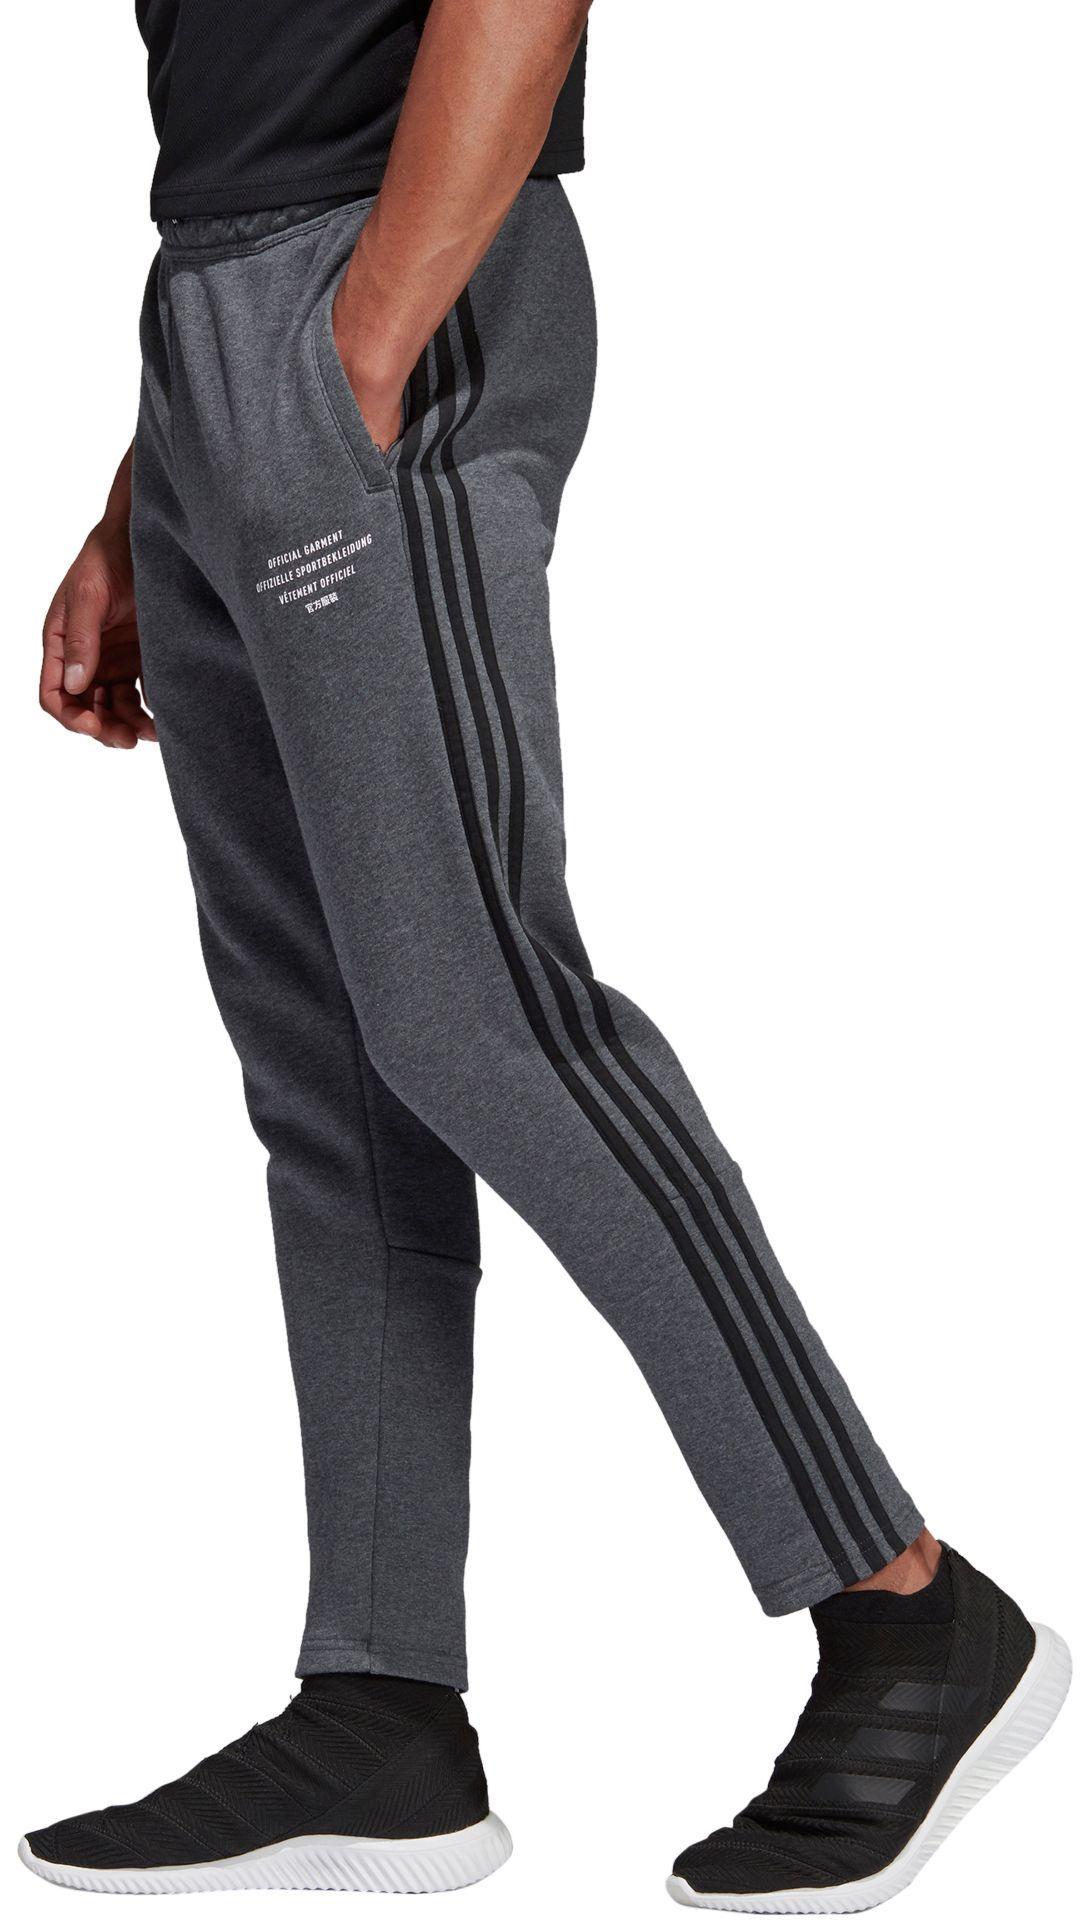 Details about adidas Tiro 19 Mens Training Pants Black